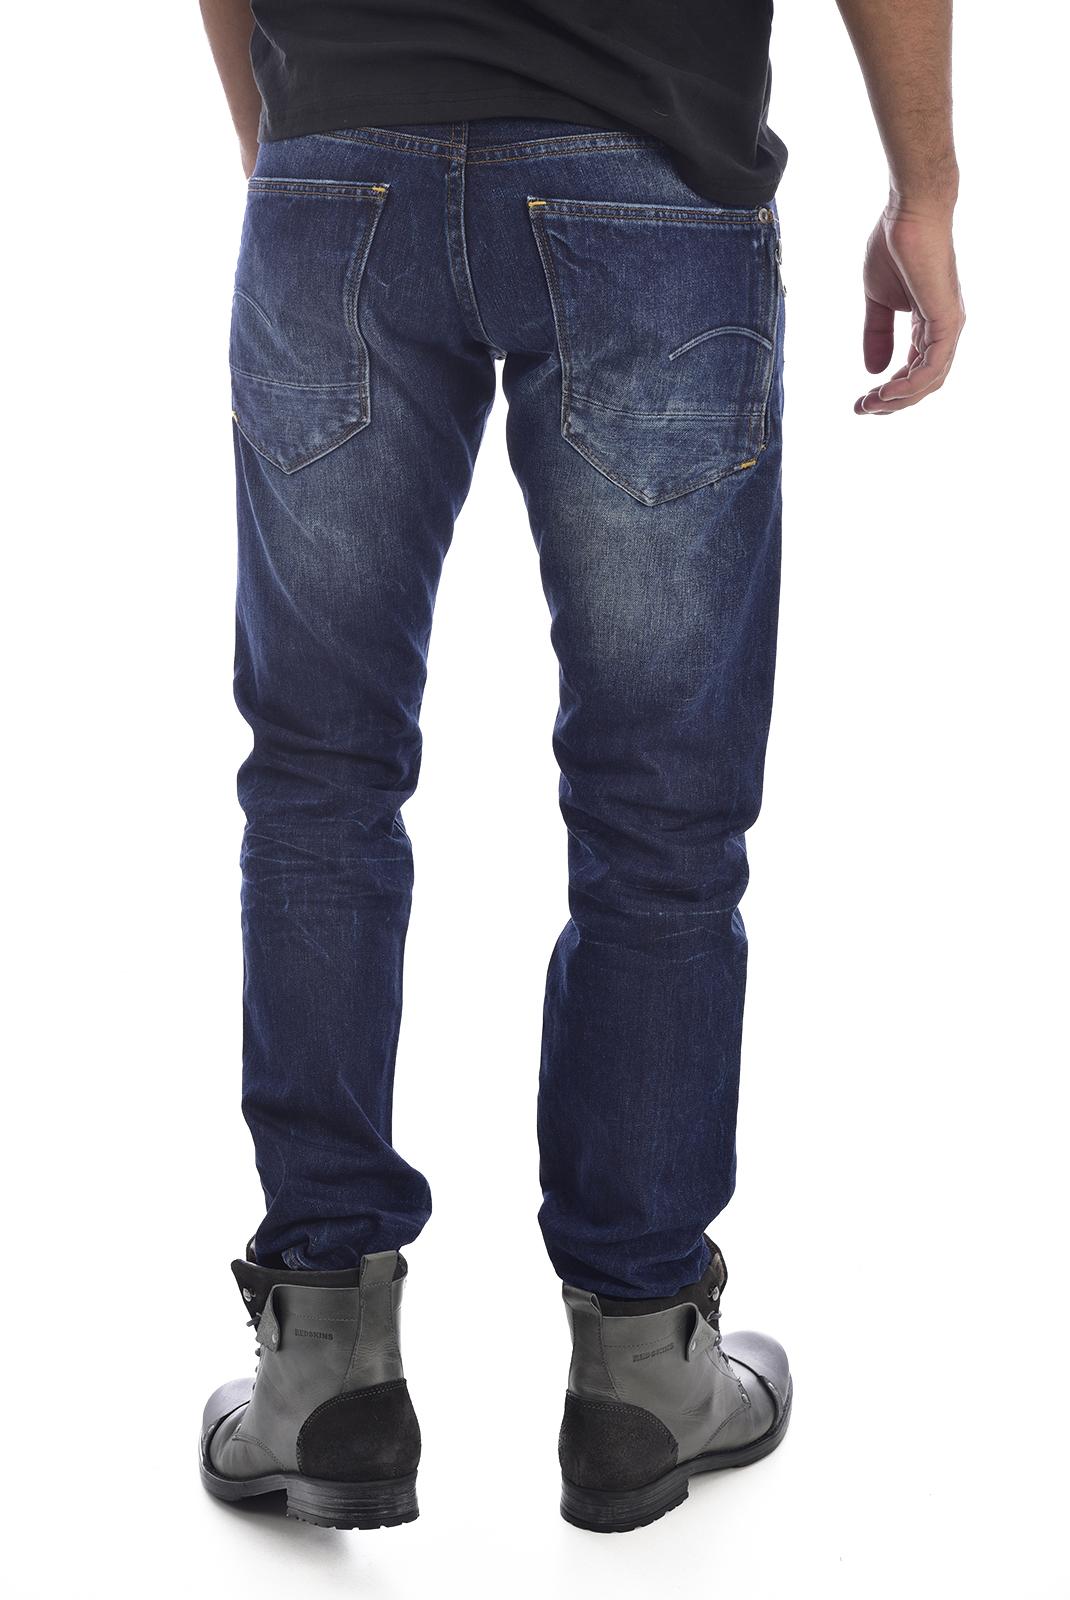 Homme  G-star 51058-5689-89 stean bleu